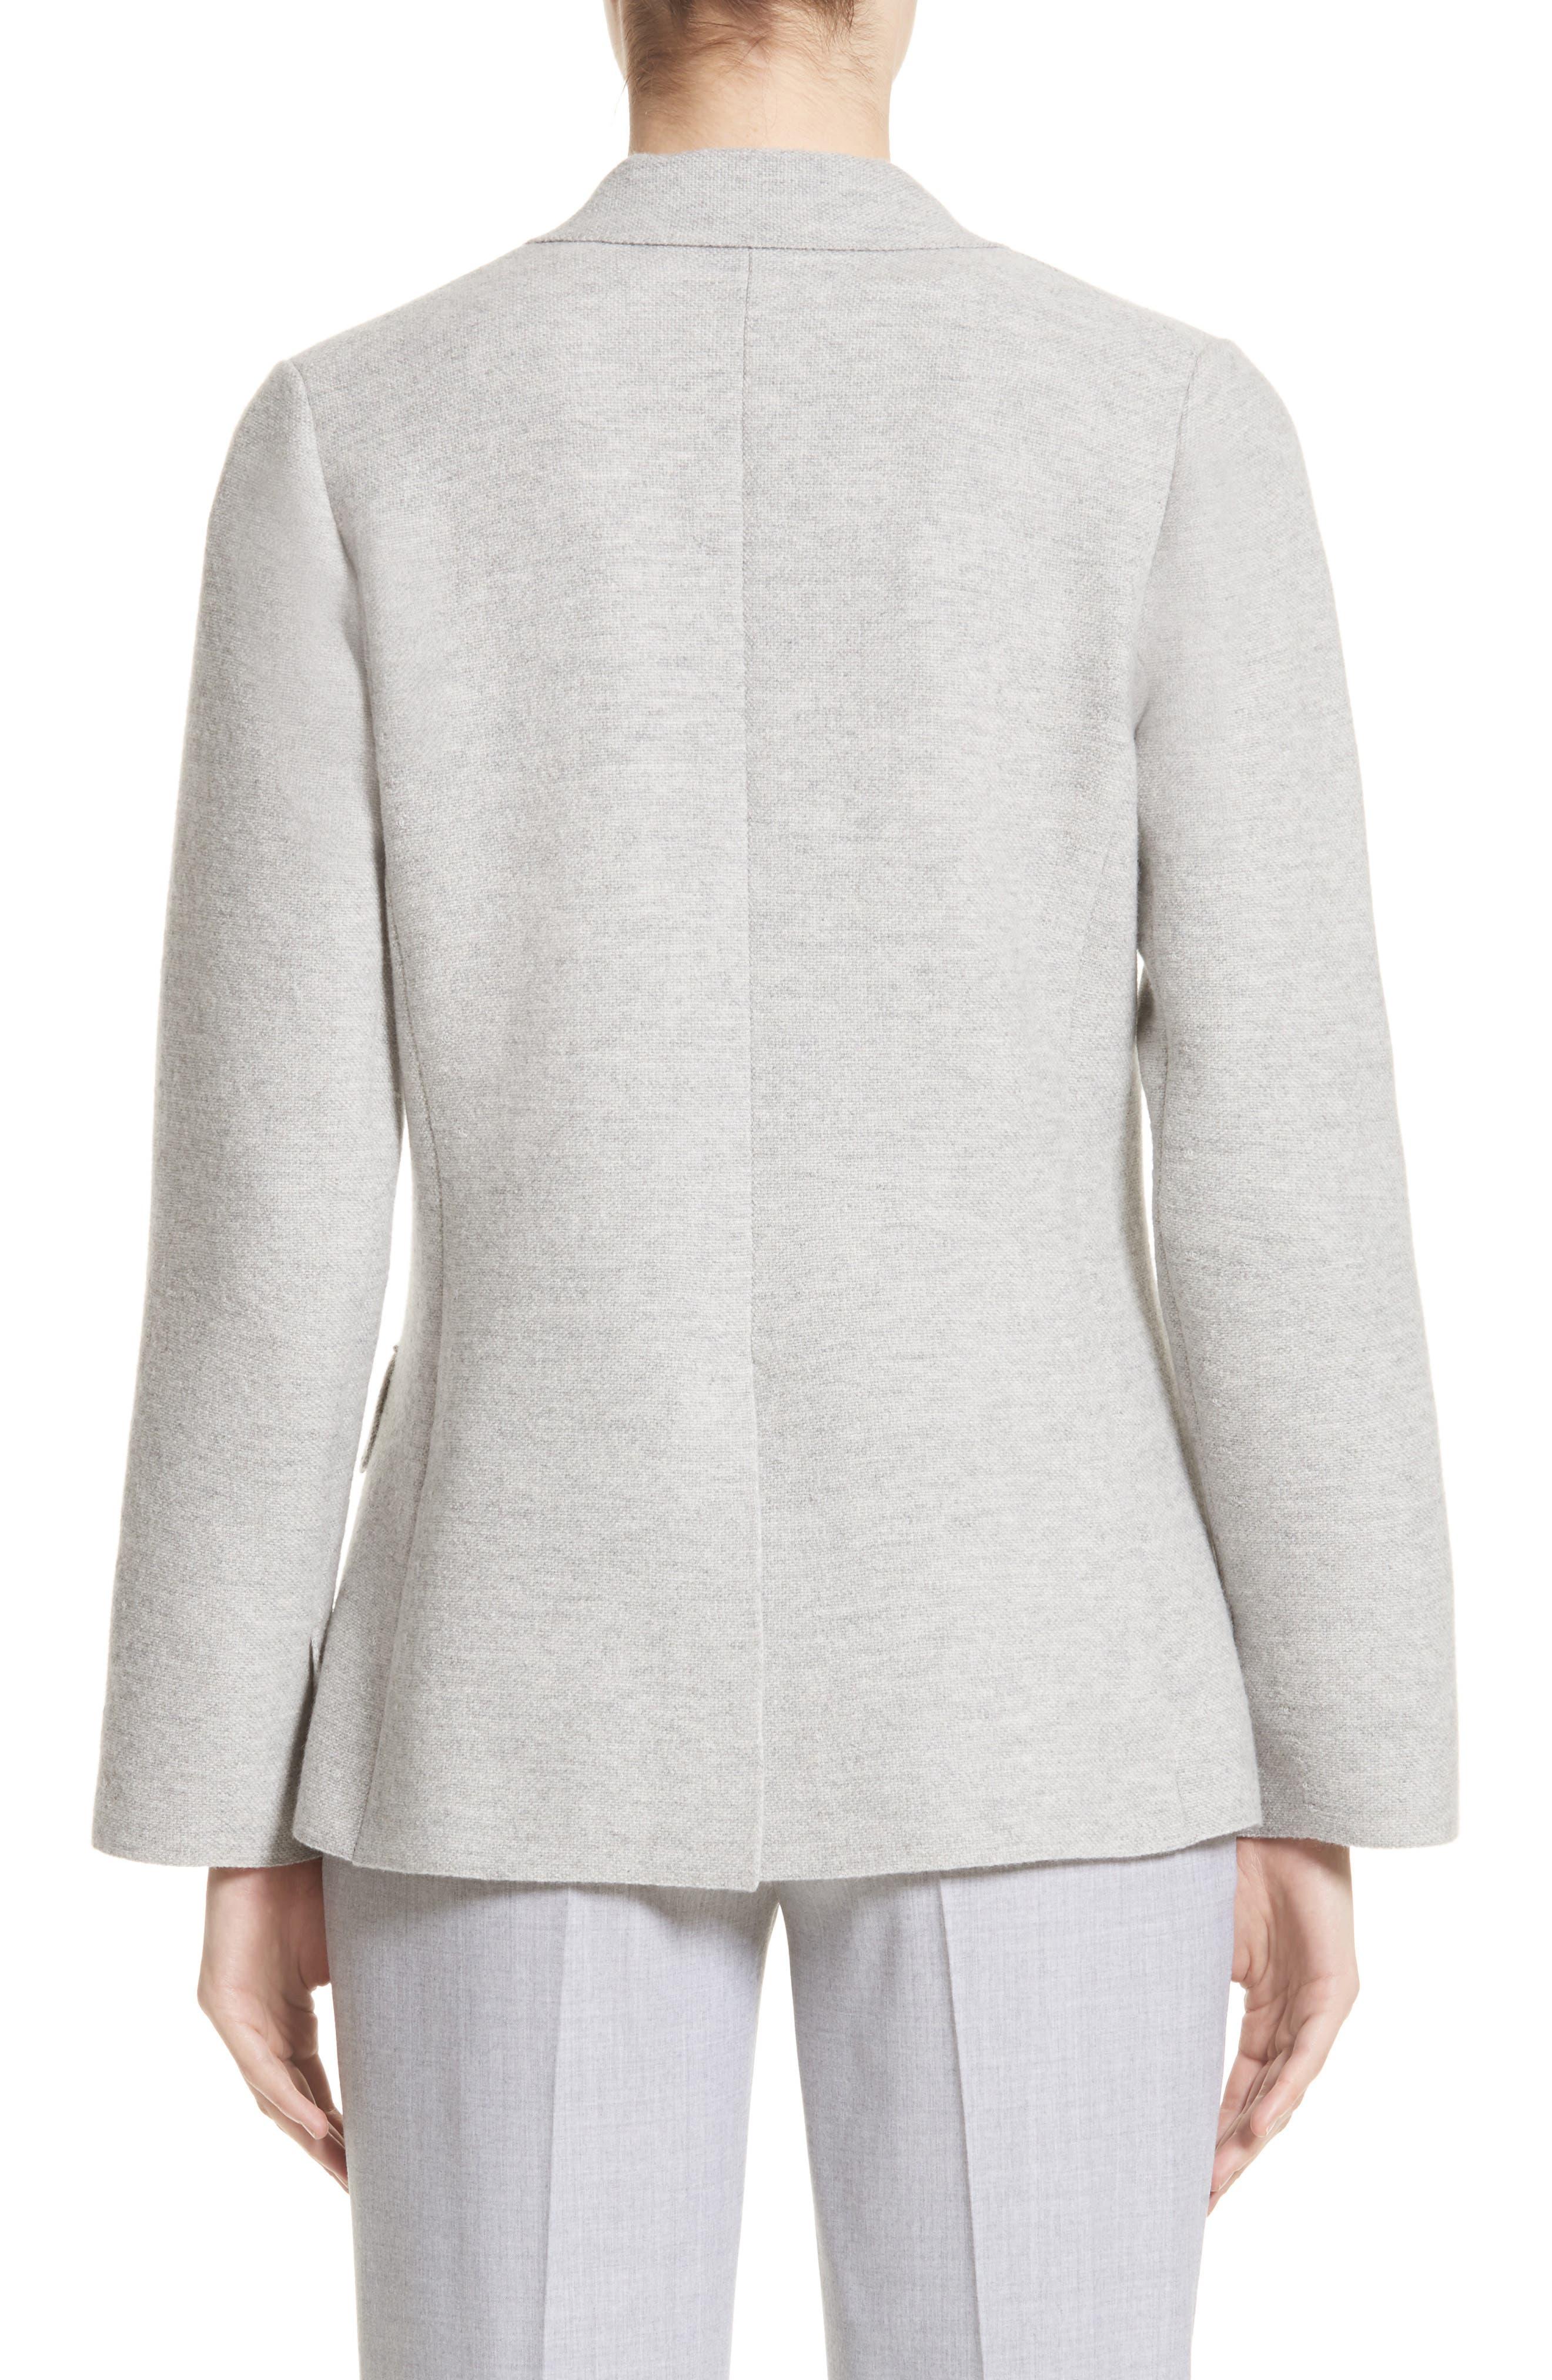 Alternate Image 2  - Max Mara Segnale Cashmere Jacket